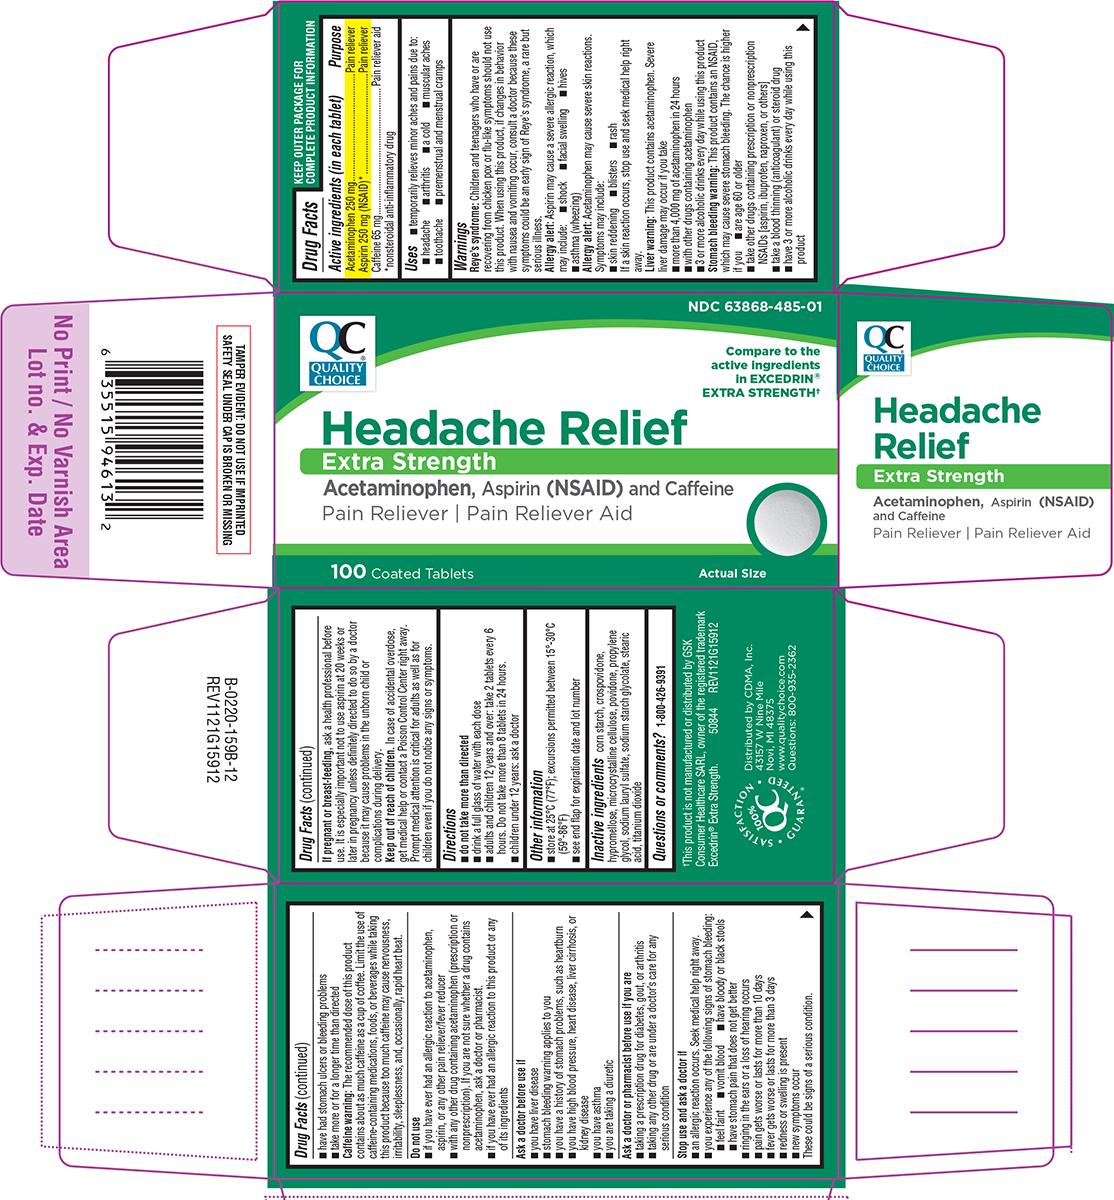 Extra Strength Headache Relief (Acetaminophen, Aspirin And Caffeine) Tablet, Film Coated [Chain Drug Marketing Association Inc]